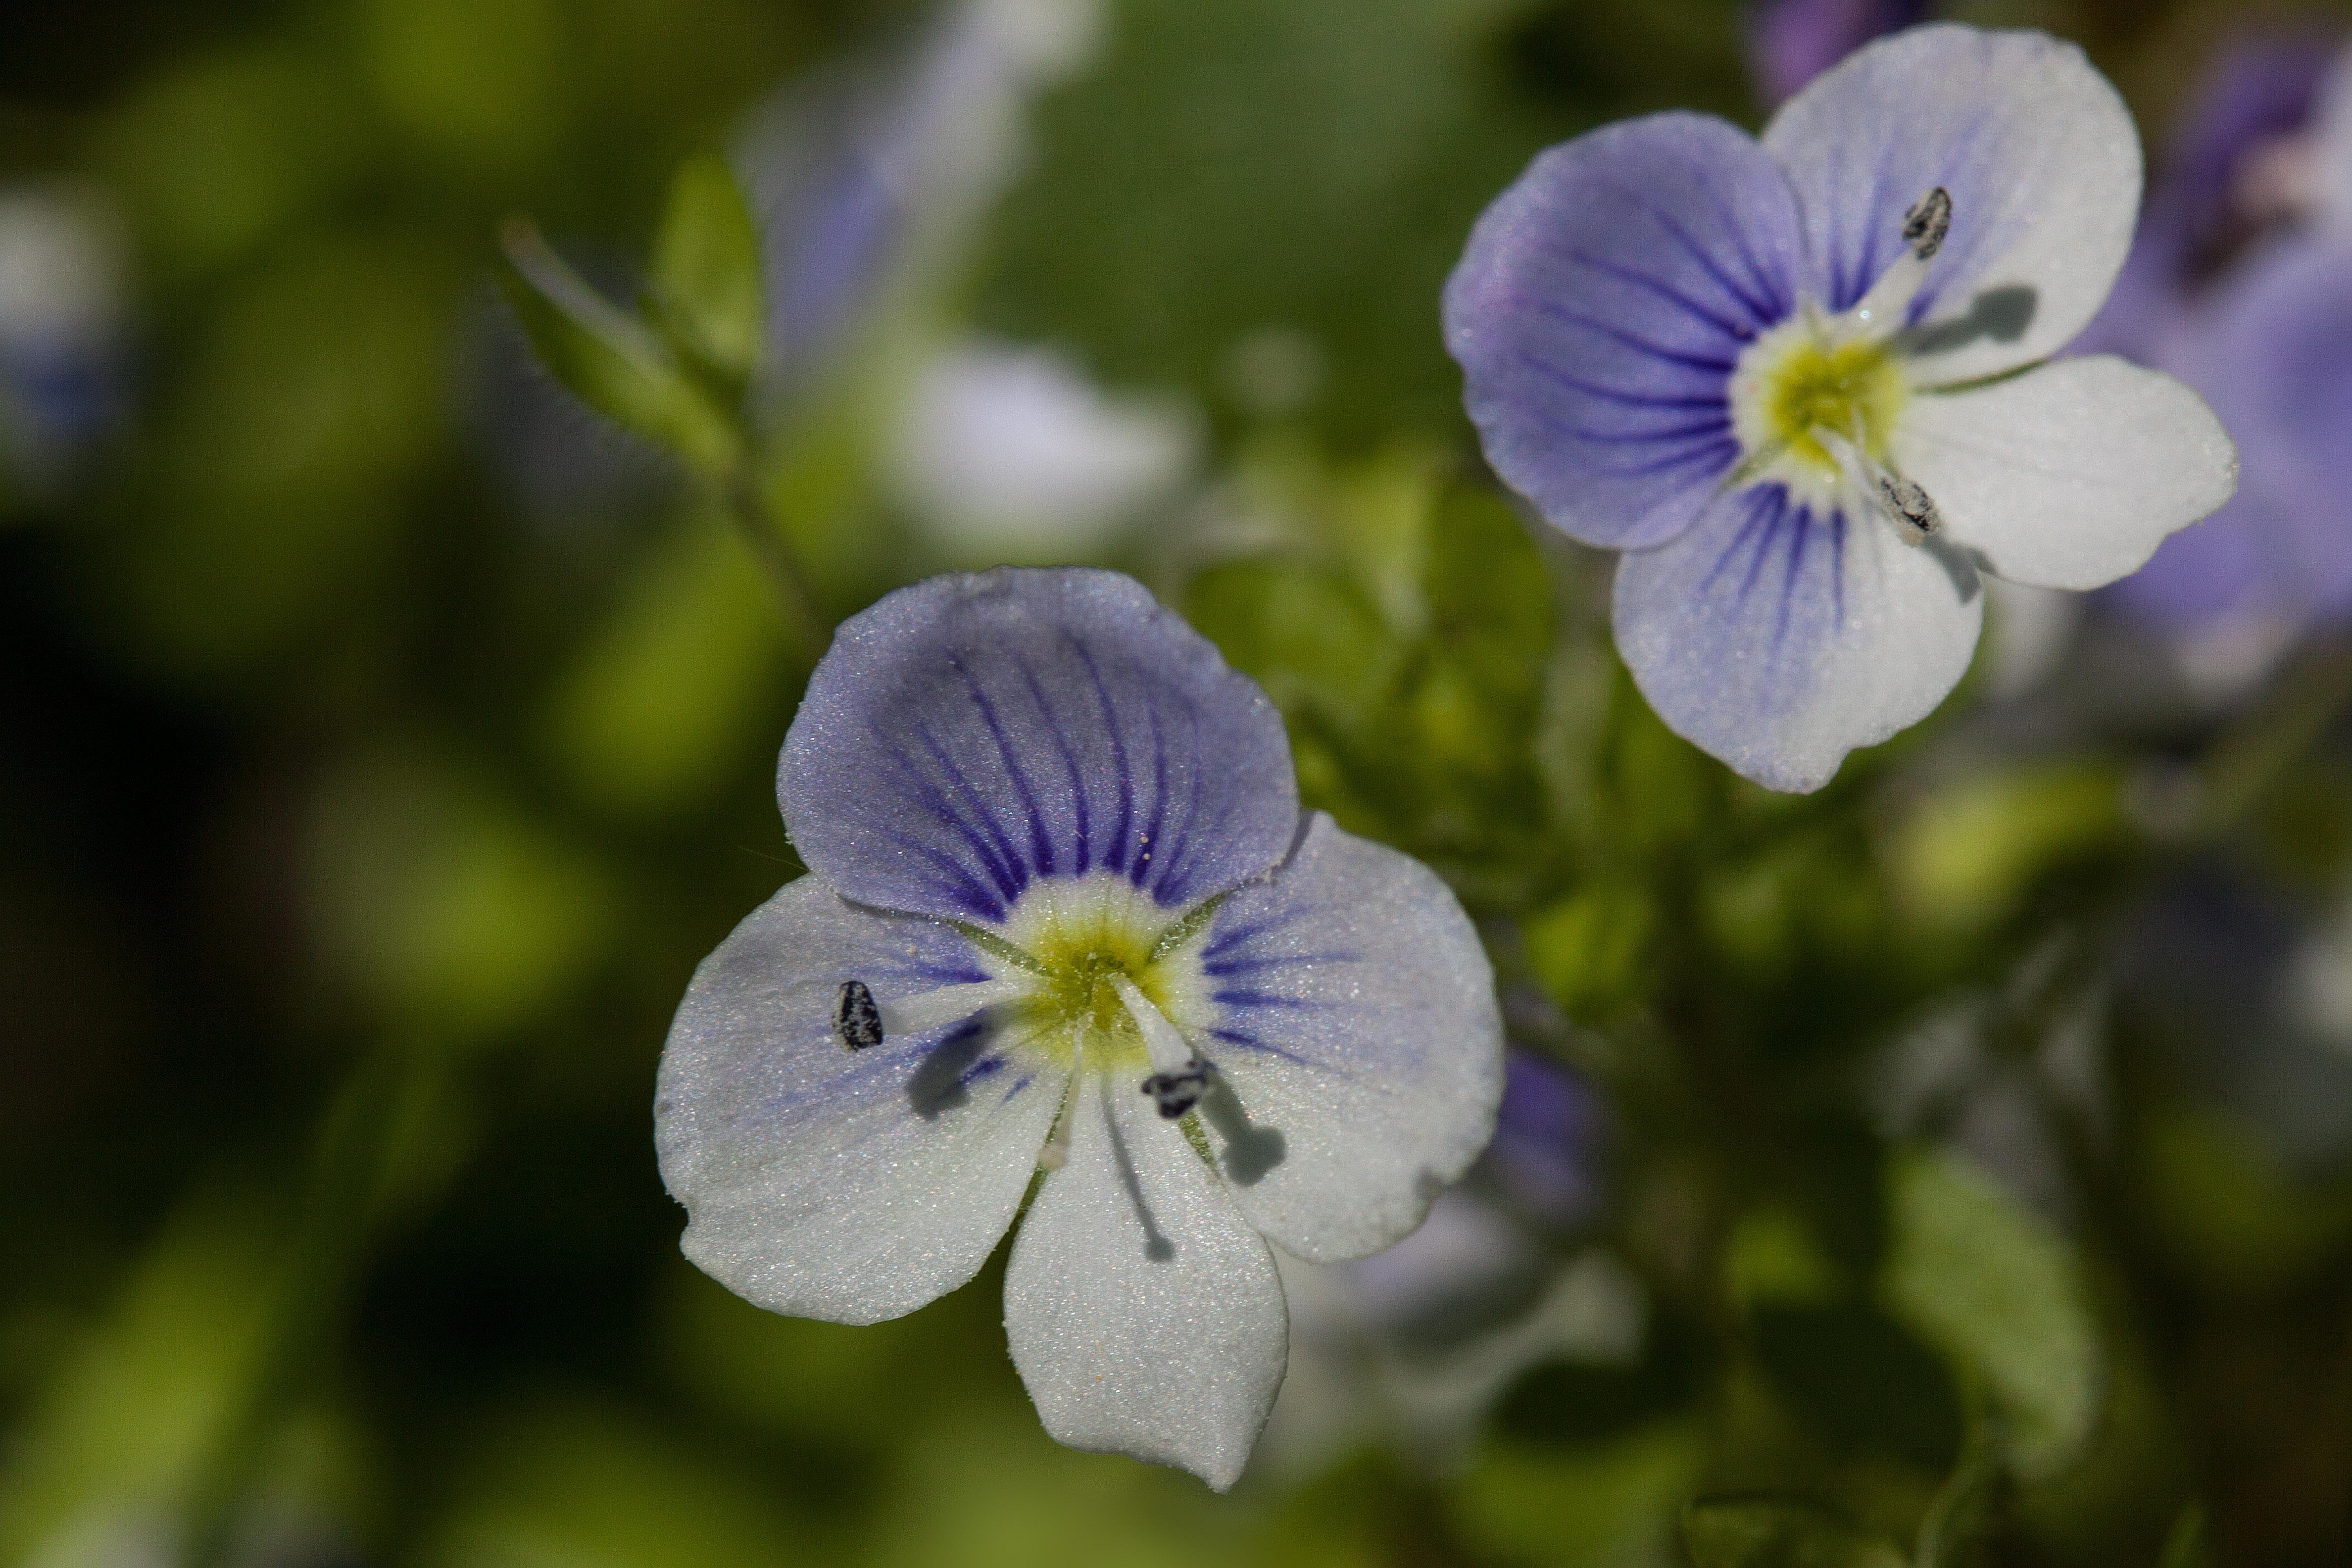 Free Images Nature Blossom White Flower Petal Pollen Spring